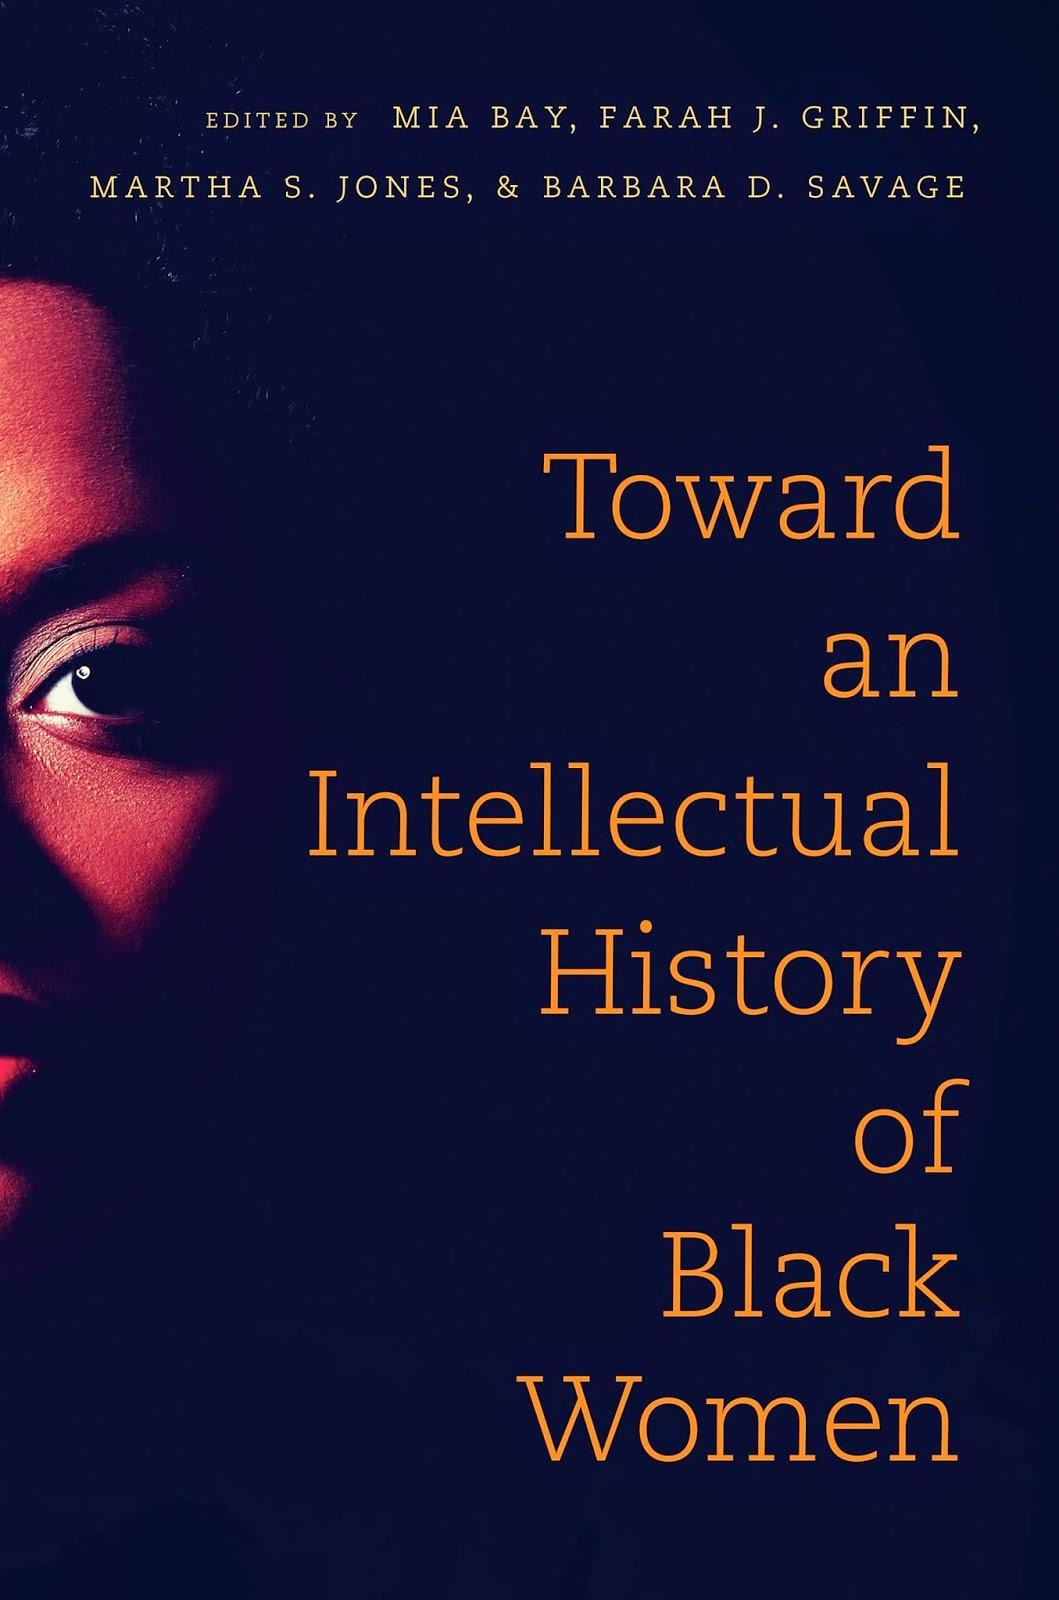 the black woman in america essay